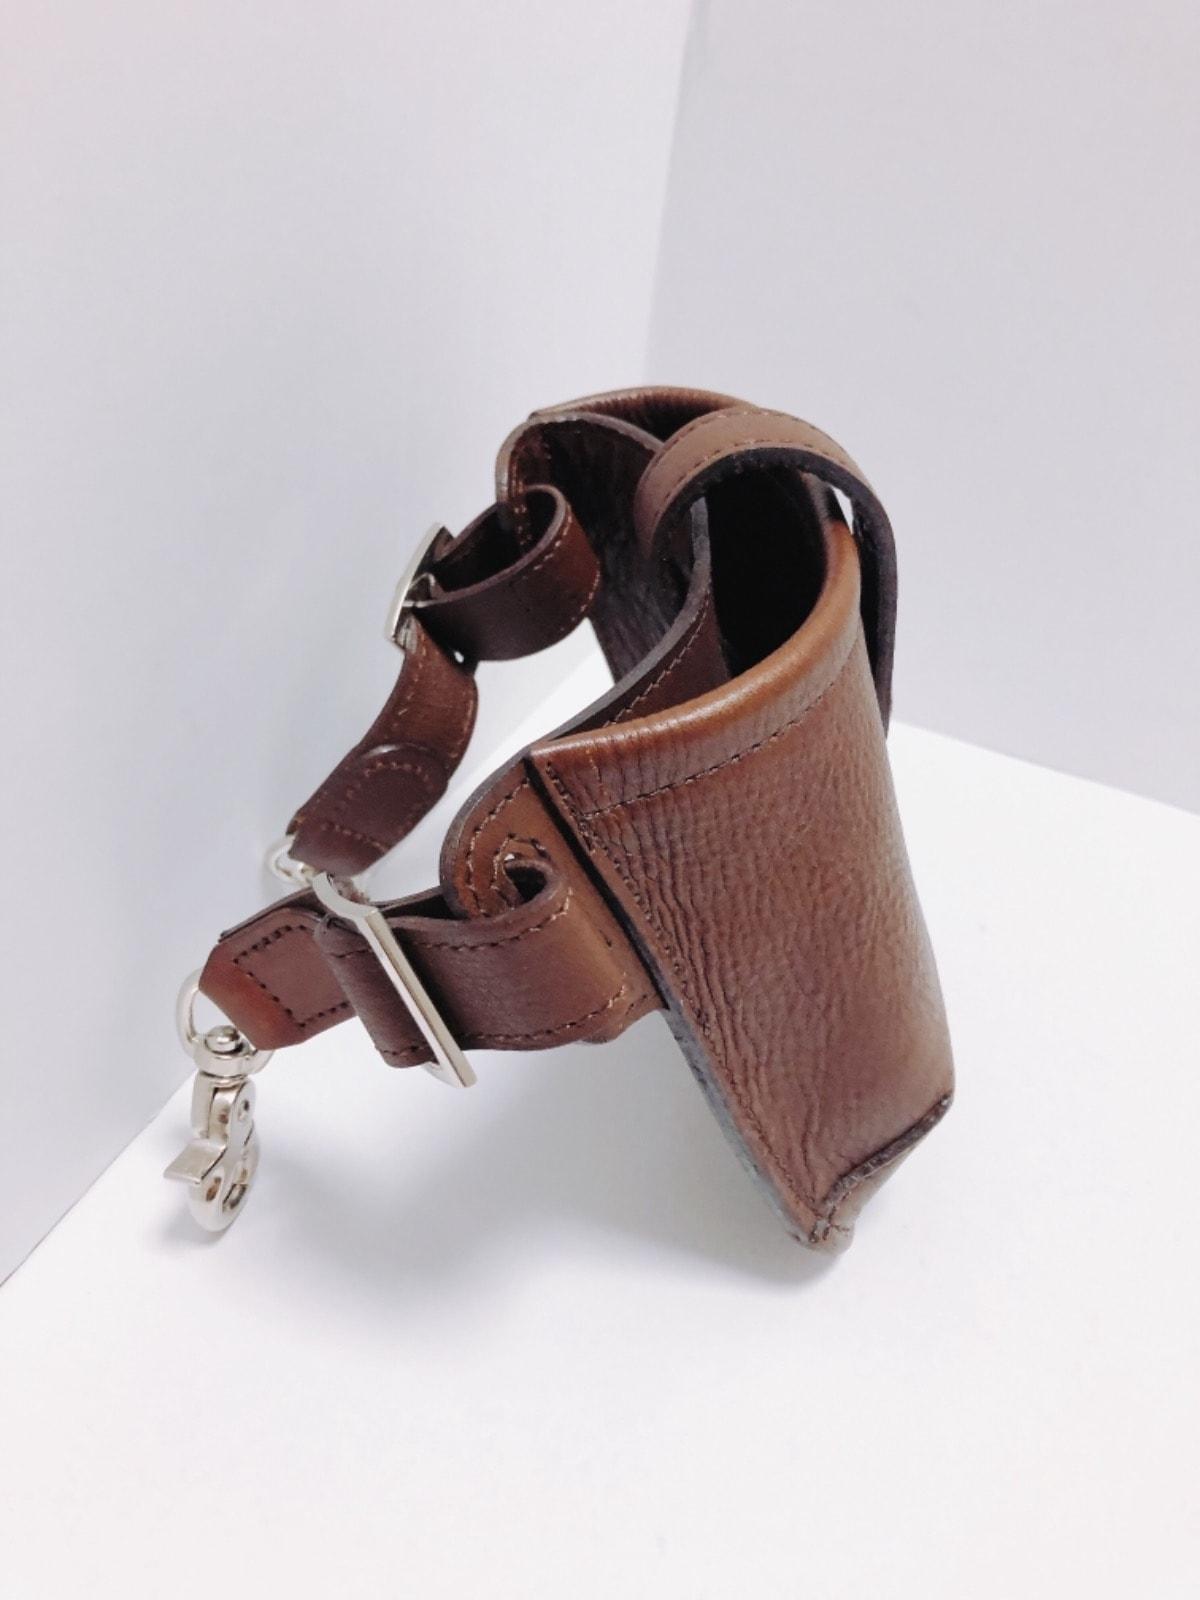 DEAL DESIGN(ディールデザイン)のその他バッグ